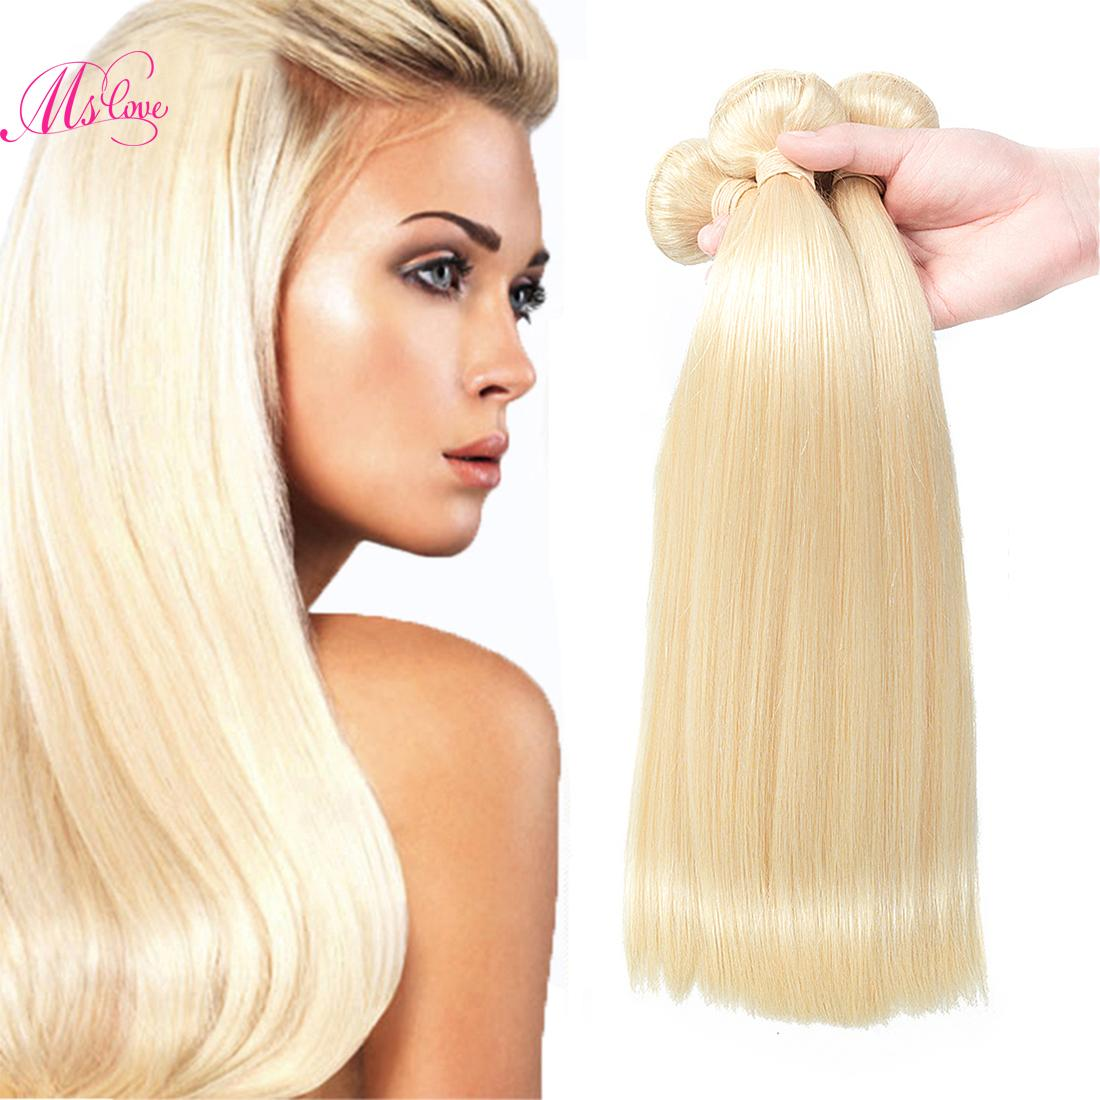 Mslove 613 Blonde Virgin Hair 3 Bundles 7a Brazilian Straight Hair